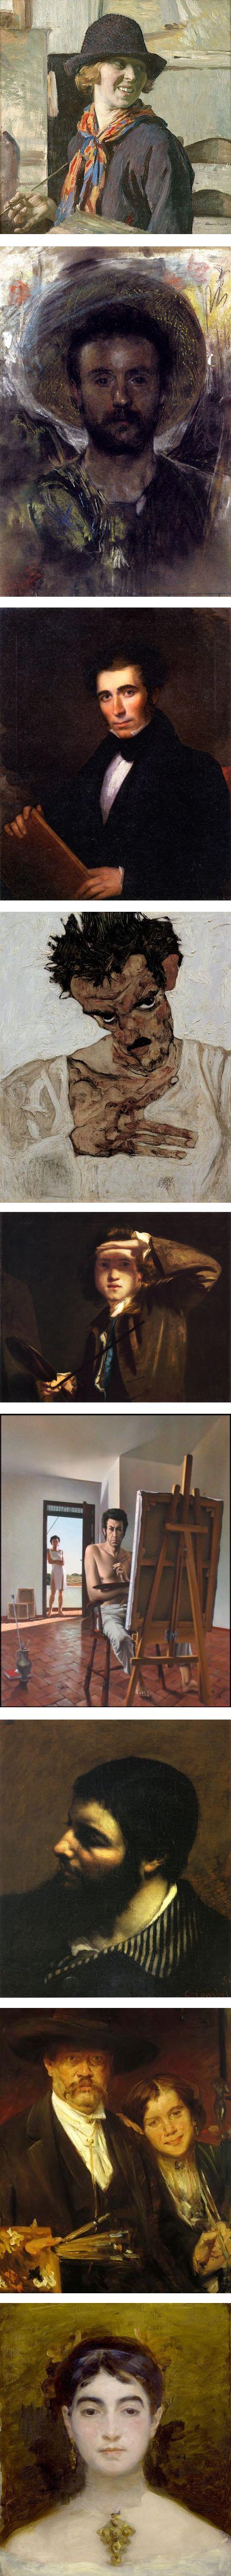 Self portraits: Ivan Shishkin, Laura Johnson Knight, Antonio Mancini, Asher B. Durand, Egon Schiele, Joshua Reynolds,  Jose Manuel Capuletti, Gustave Courbet, Lovis Corinth, Marie Bracquemond